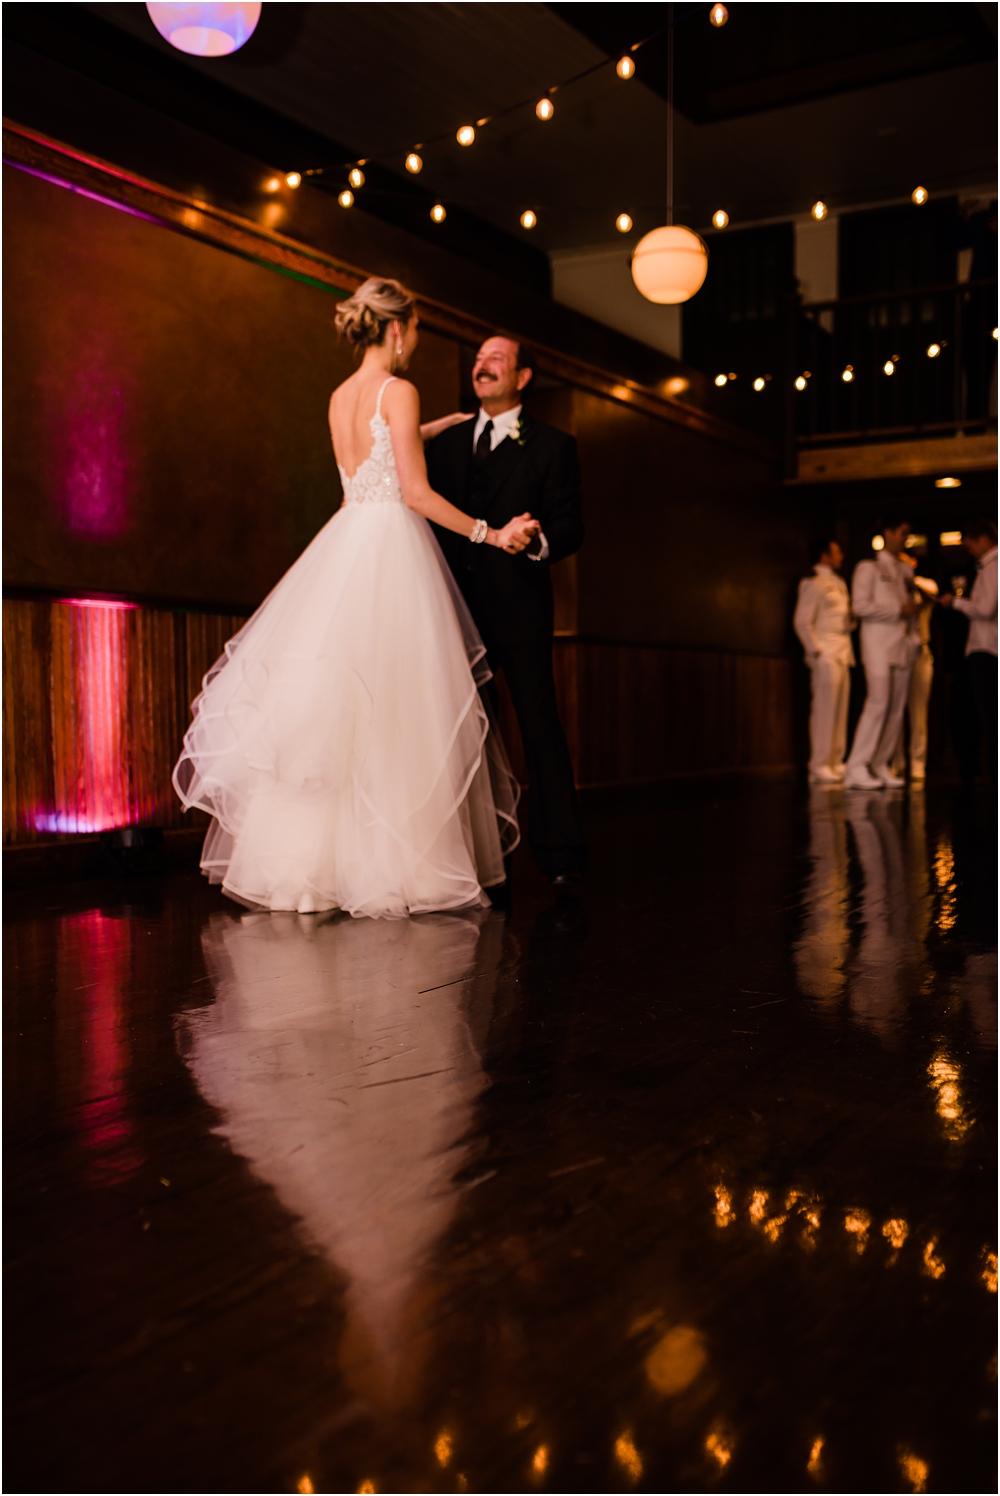 oconnor-pensacola-florida-wedding-photographer-kiersten-taylor-121.jpg